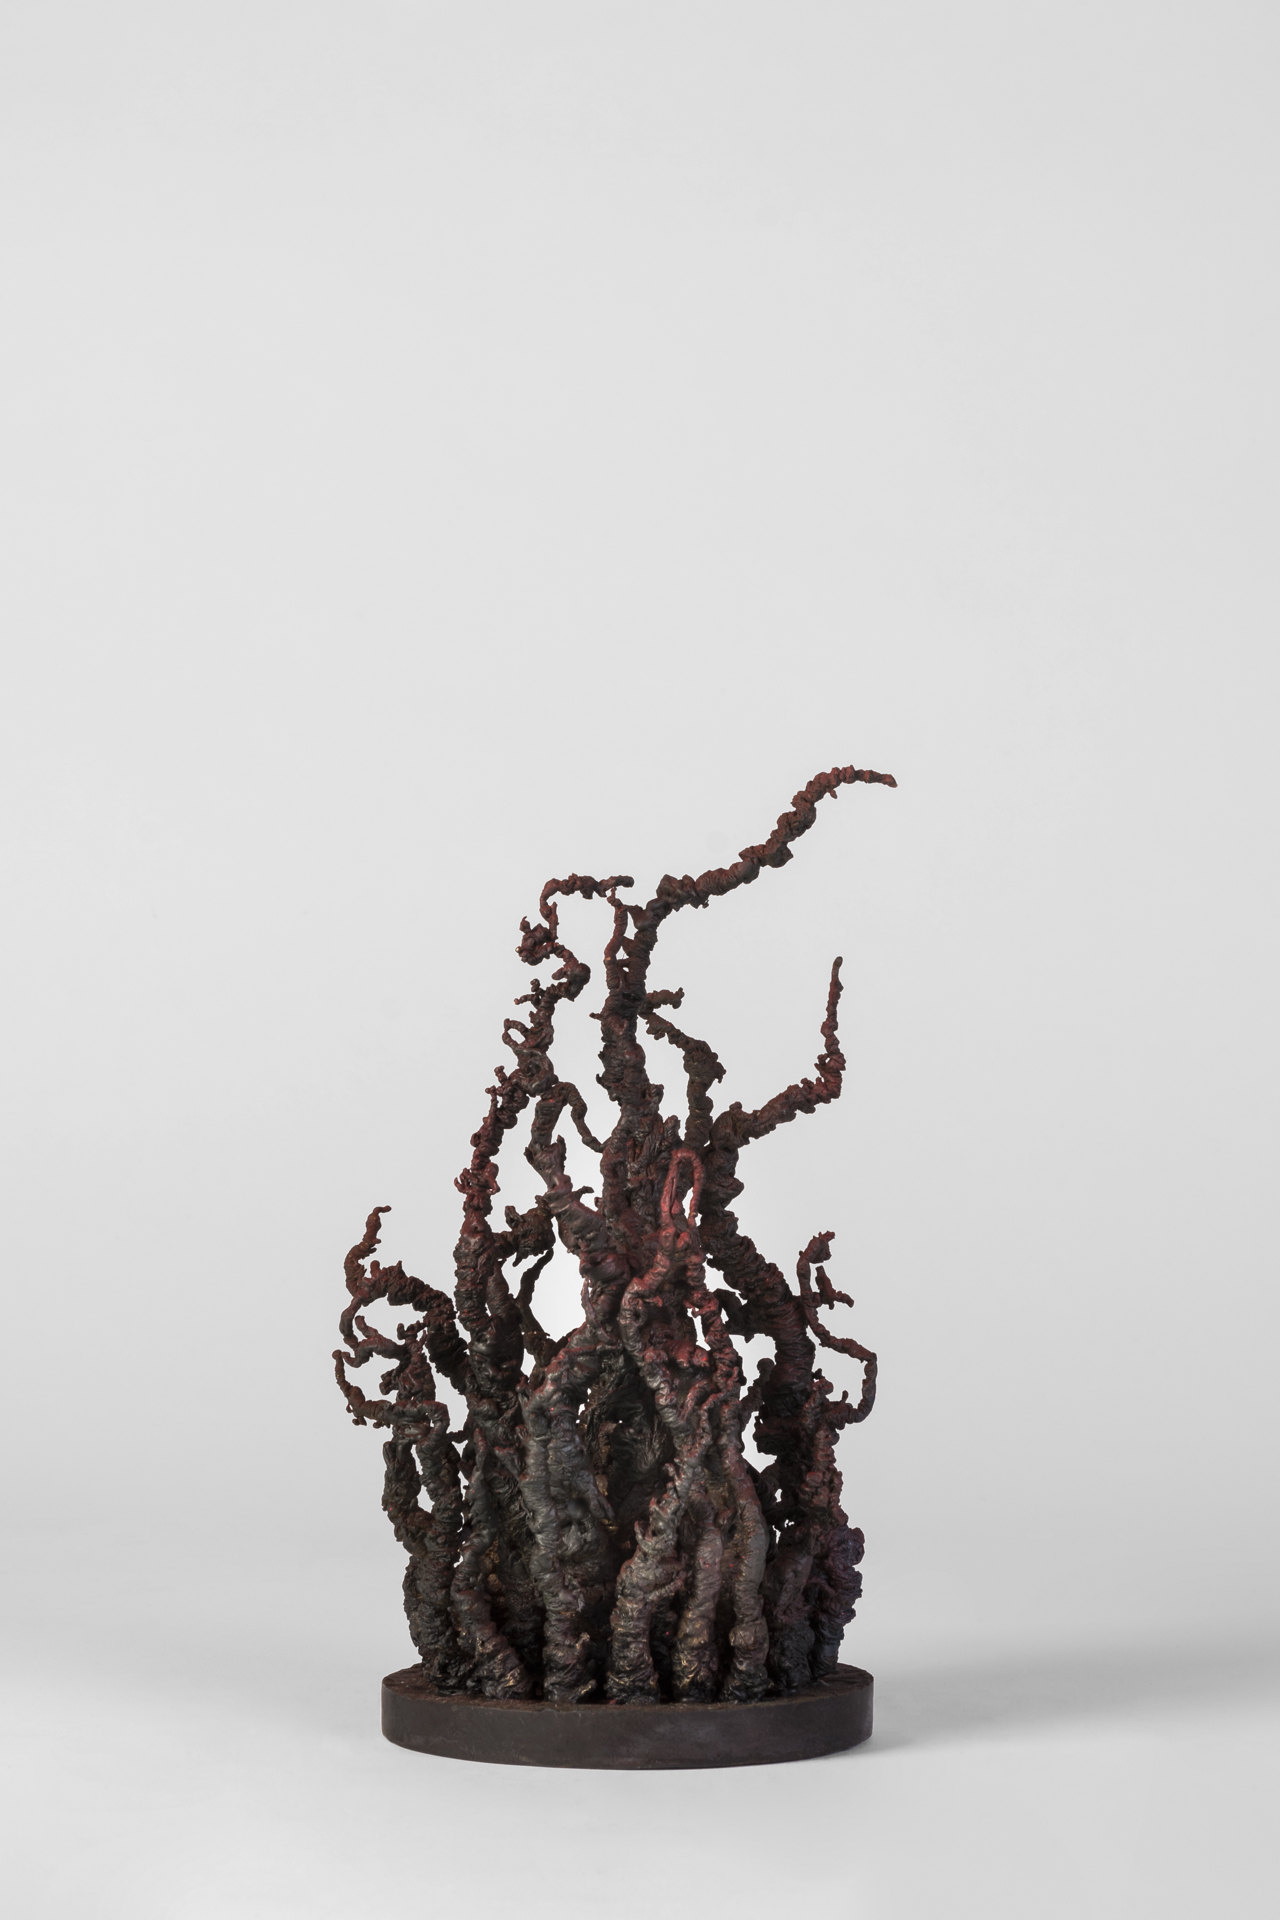 10.Origins(wildwood2)(14cmx14x27alt)(latón policromado)2017.jpg